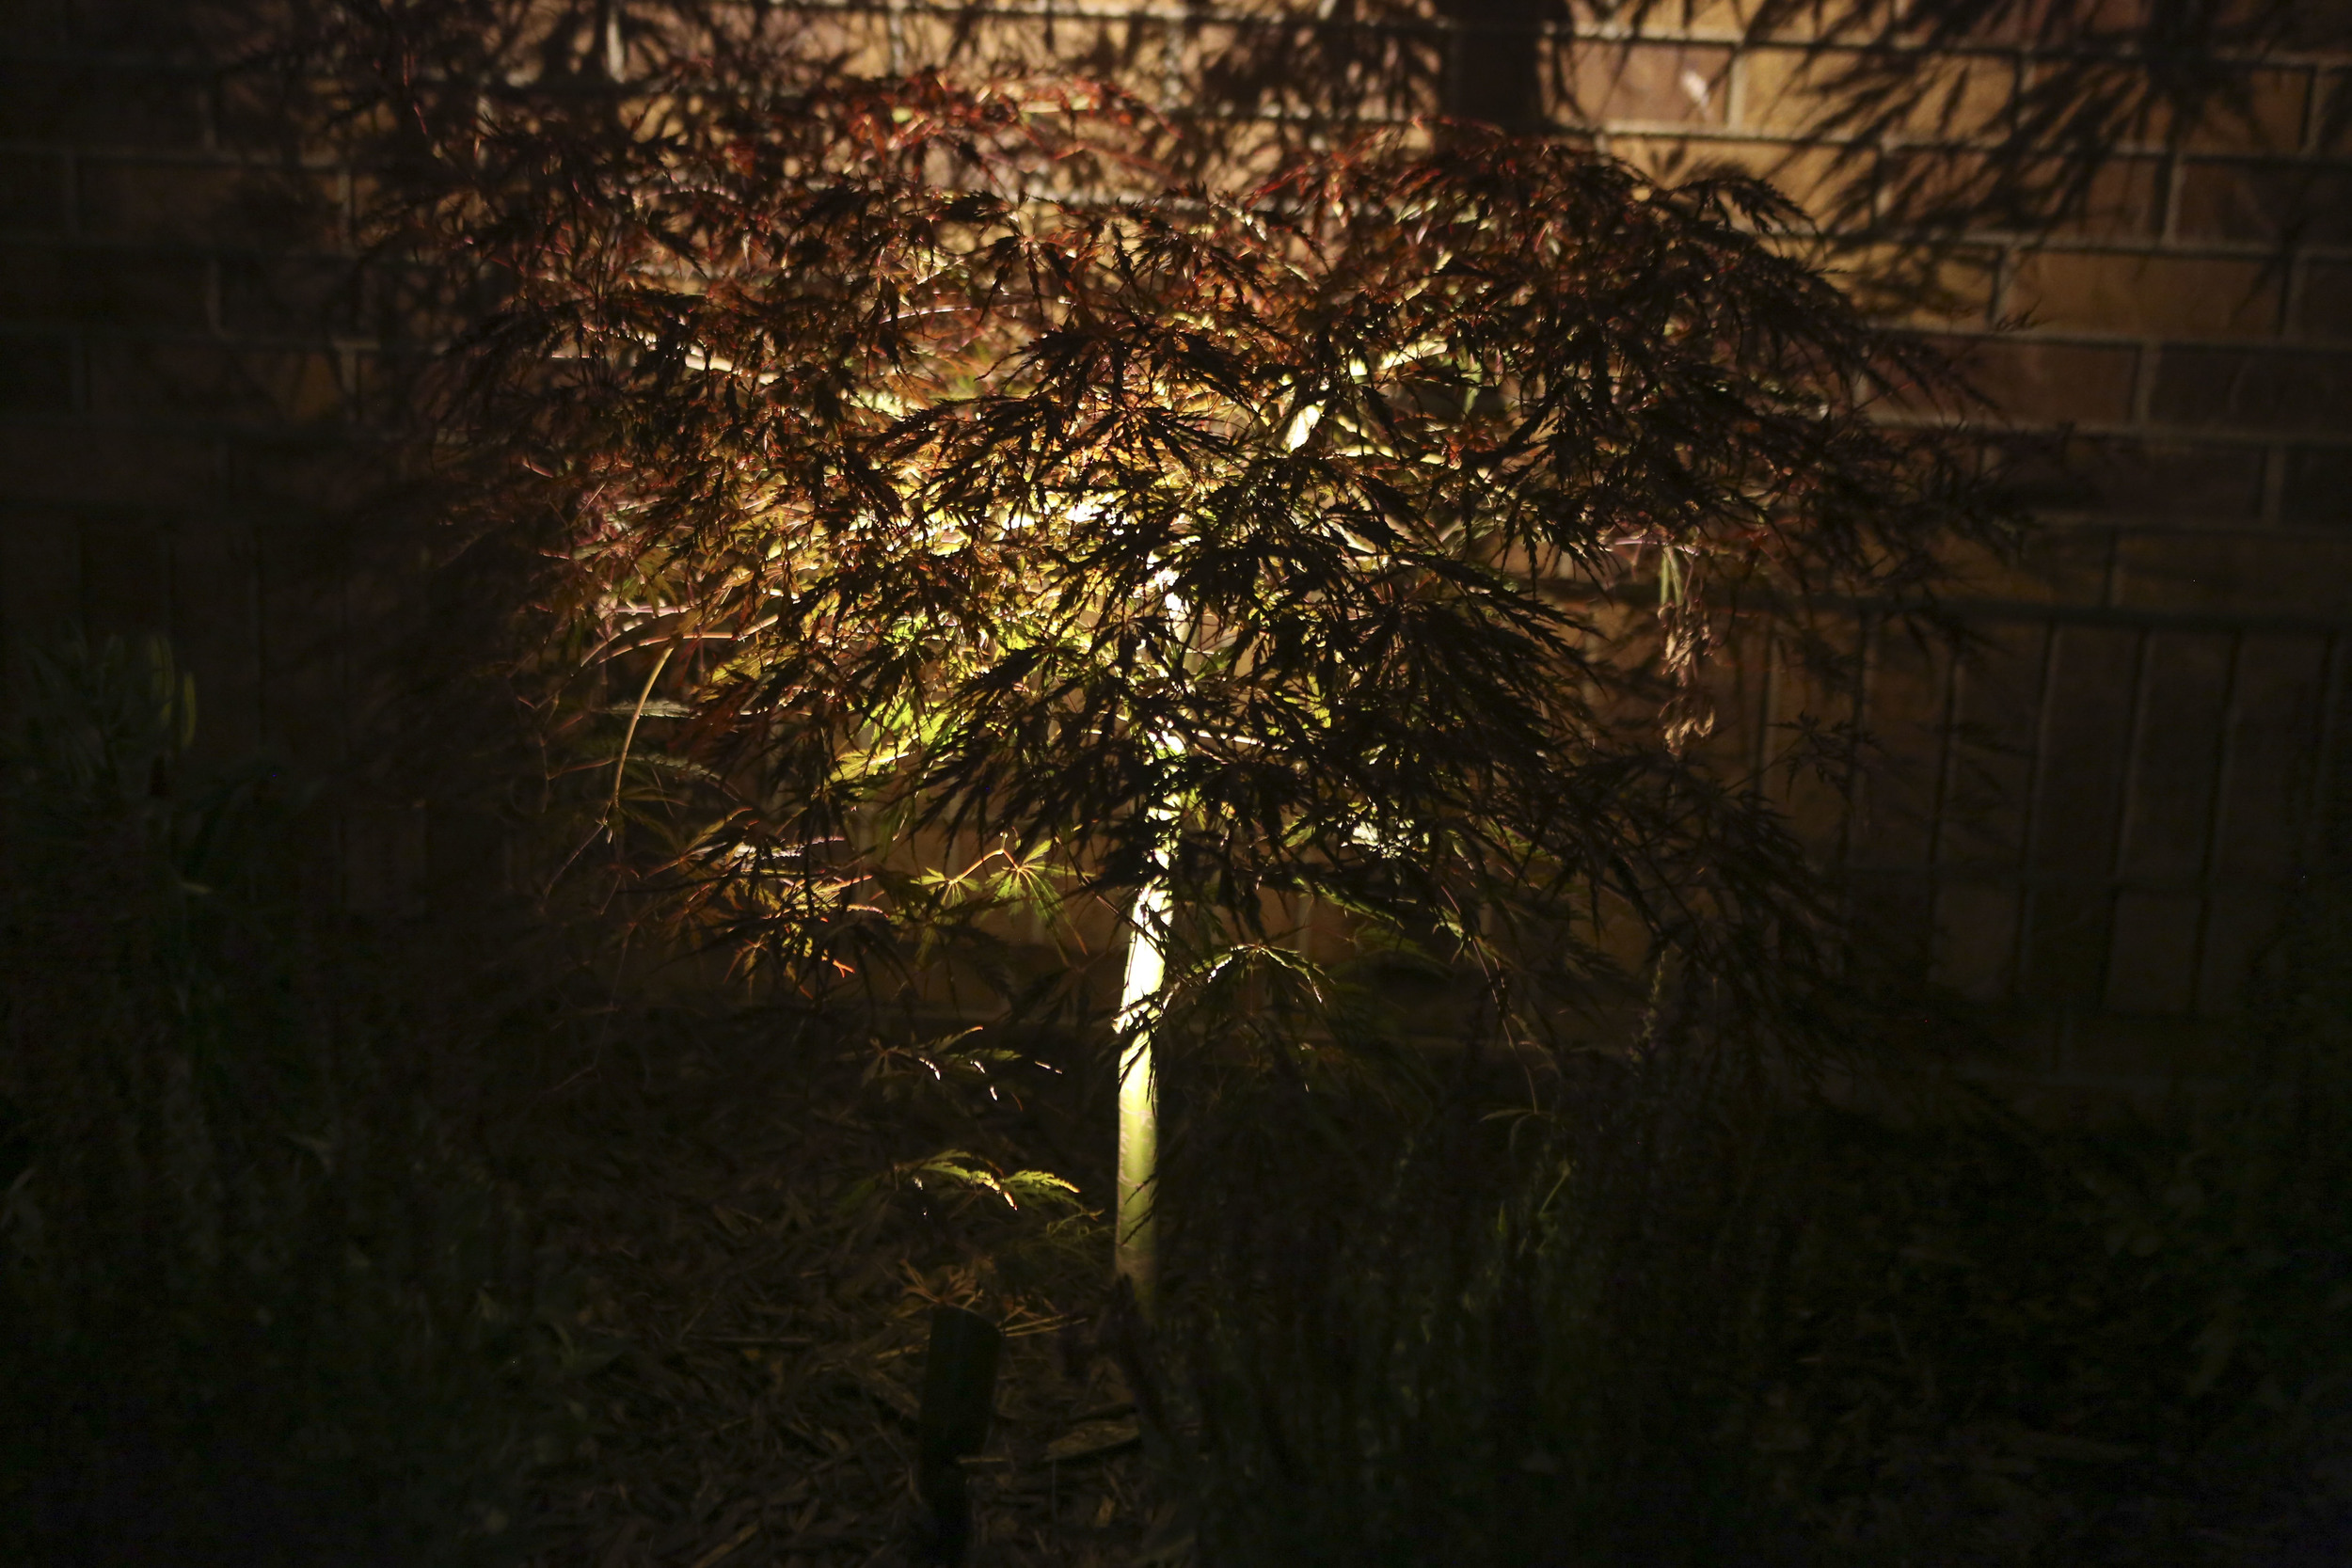 nightscapes_51.JPG